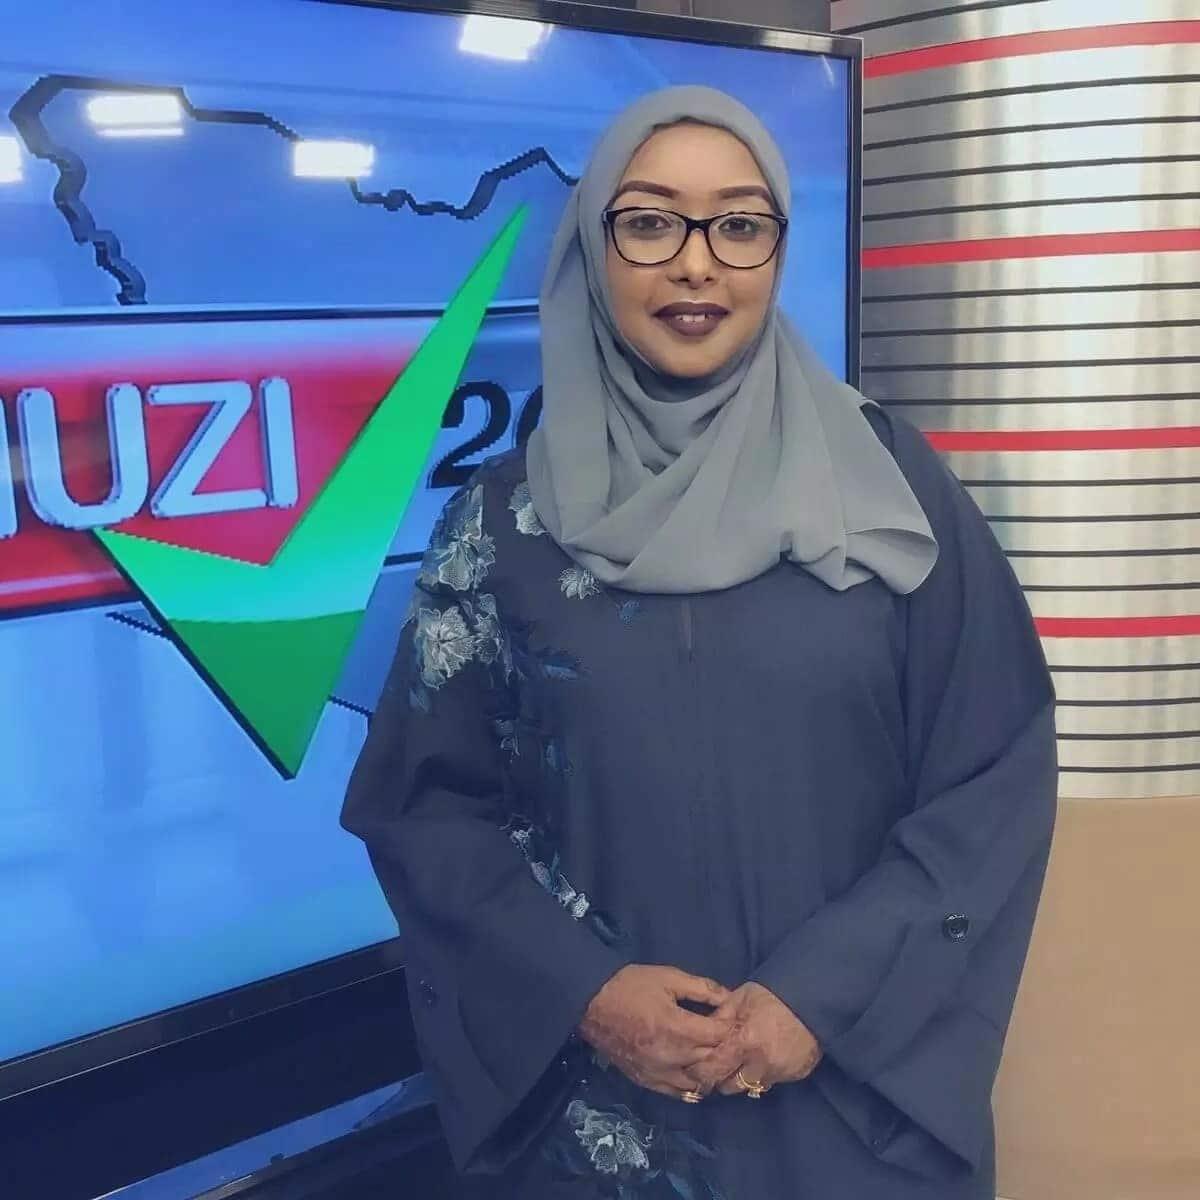 Citizen tv presenters Citizen tv presenters profile Citizen tv presenters images List of citizen tv presenters know zone tv presenters